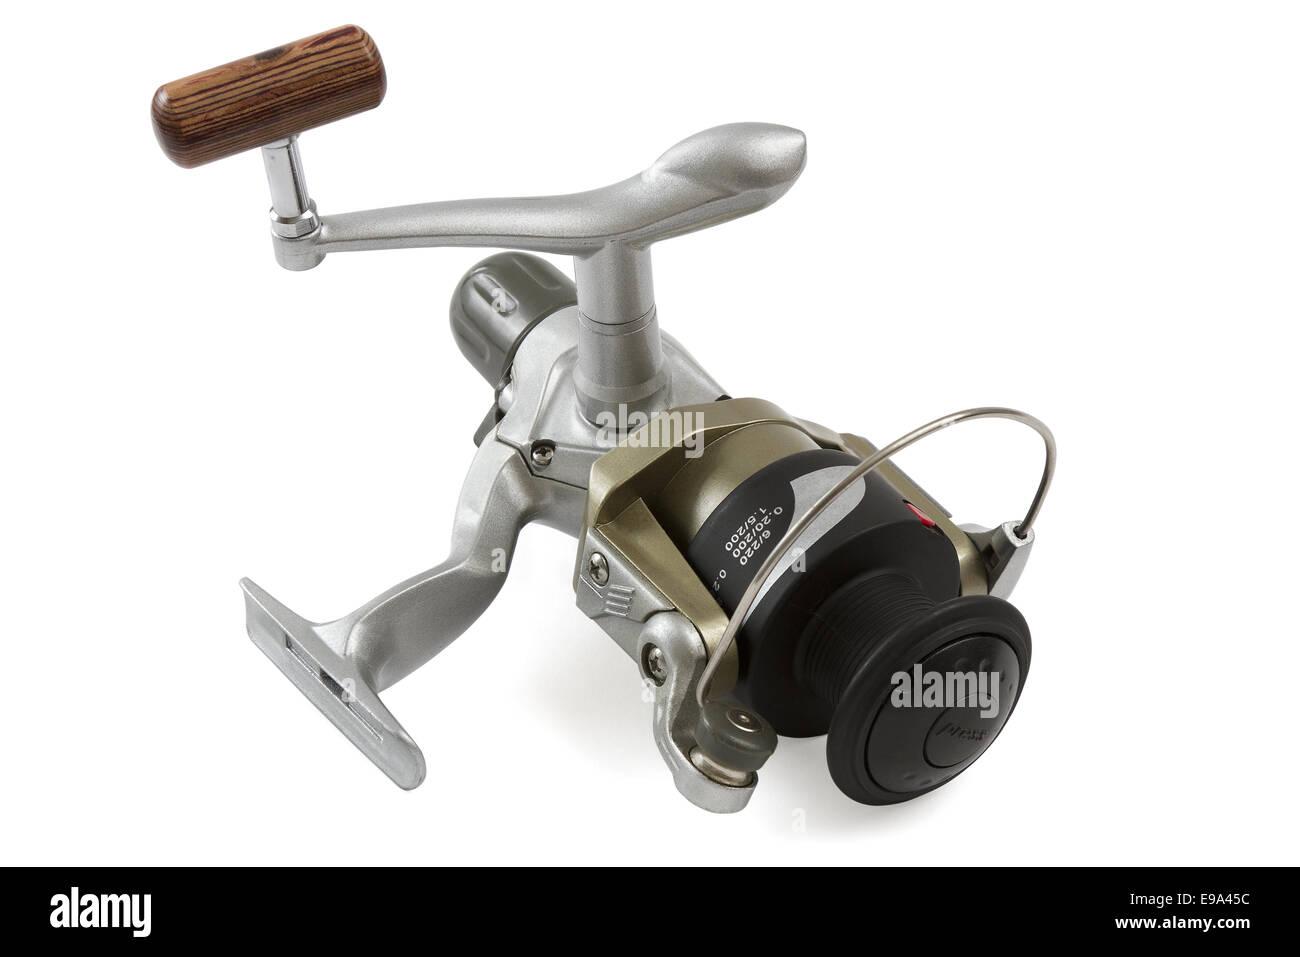 Fishing Reel - Stock Image